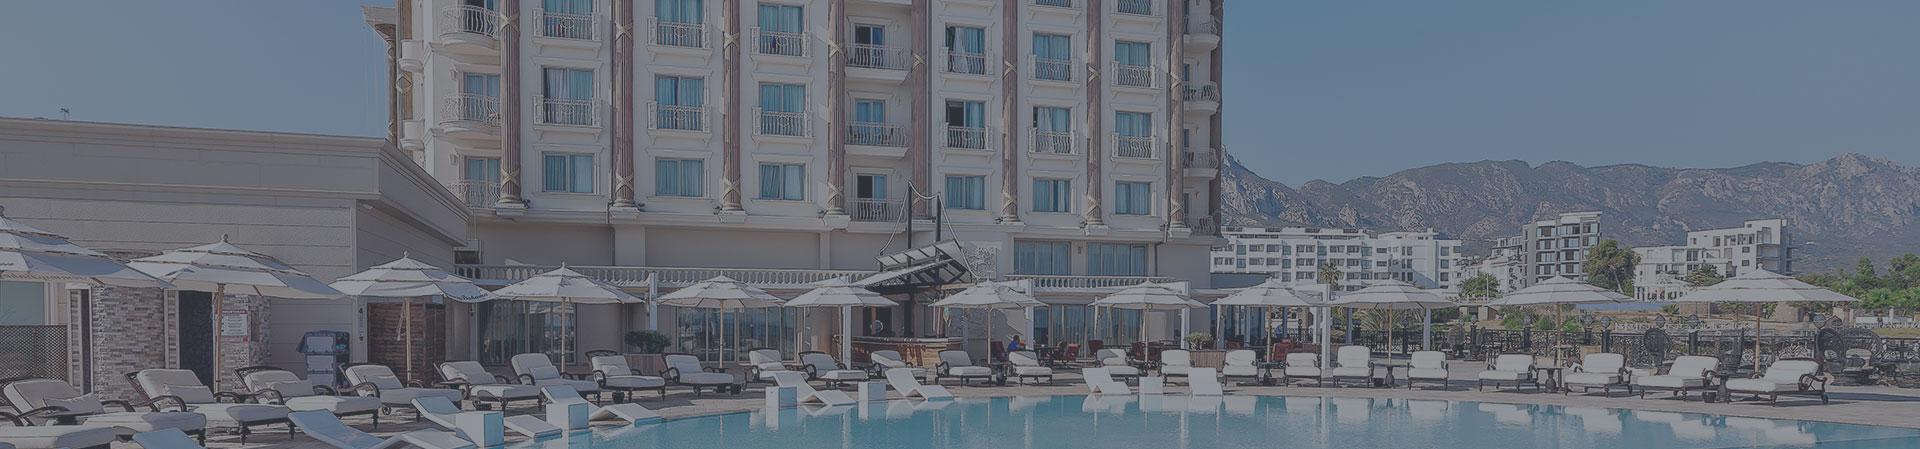 concorde luxury resort casino yorumlarД±